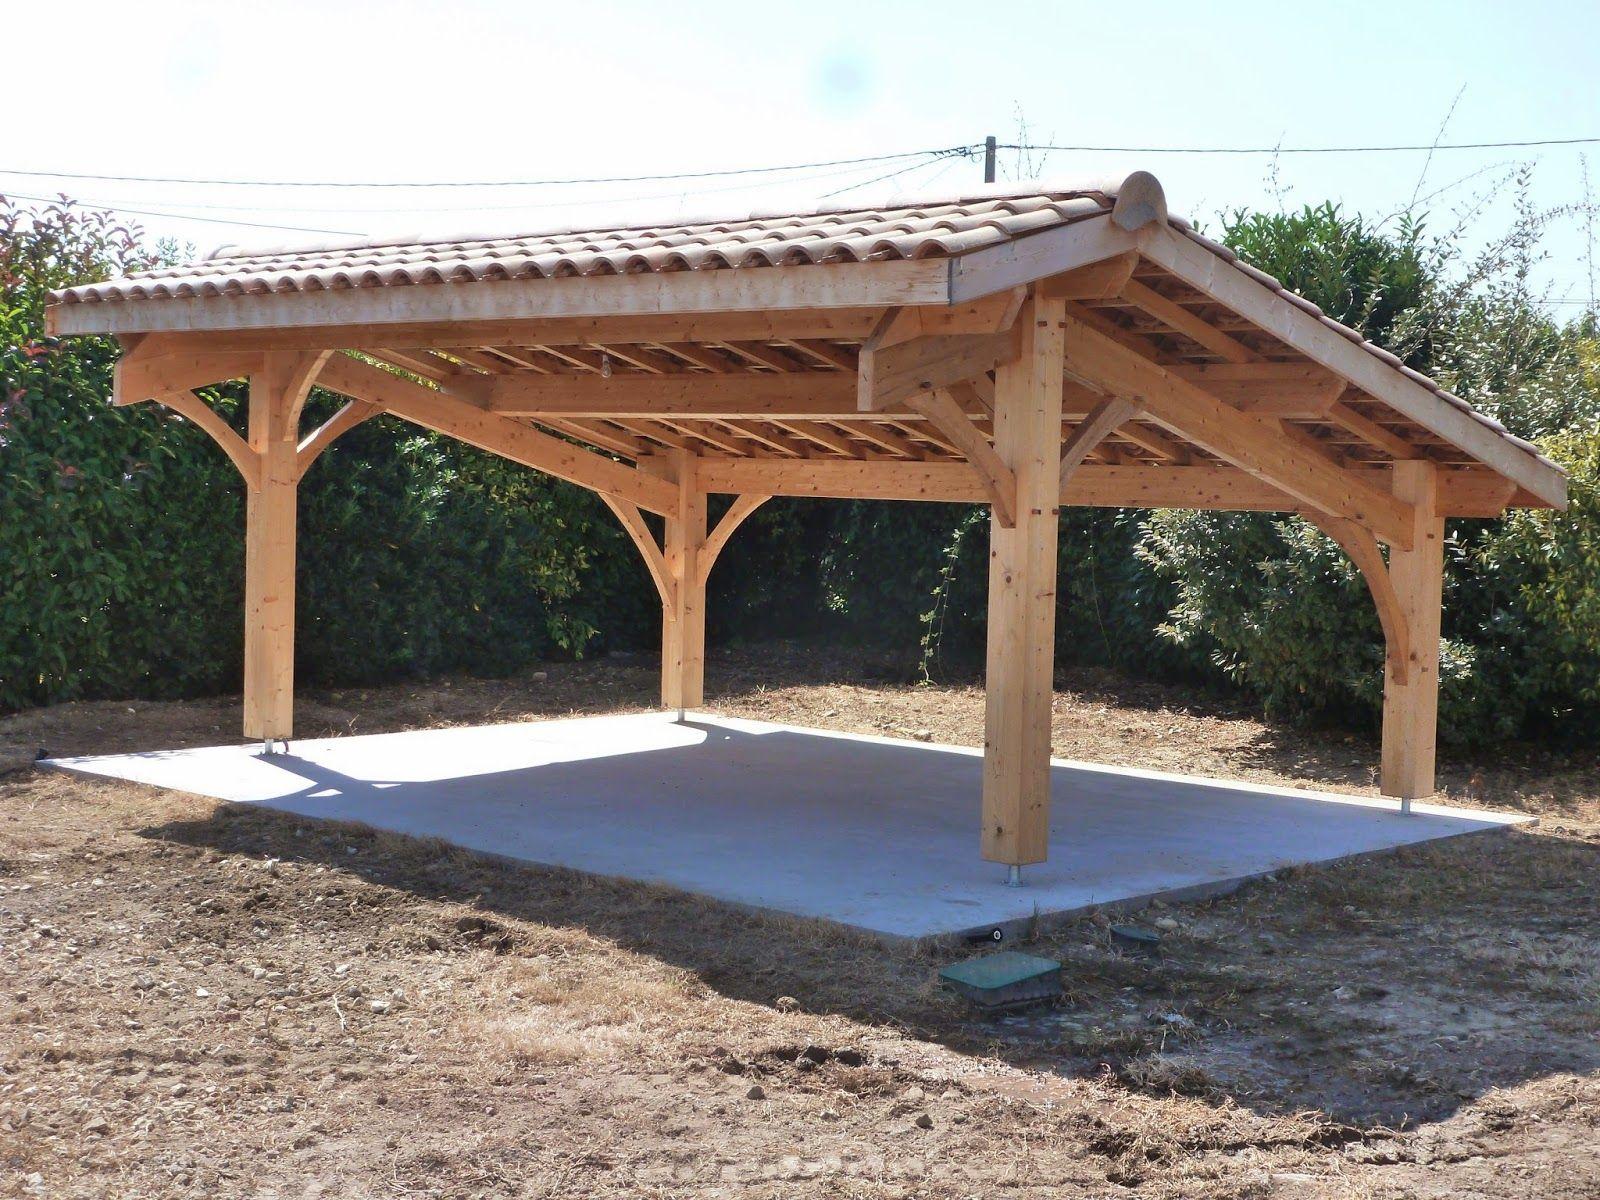 Wiara Garazowa Carport Designs Backyard Pavilion Carport